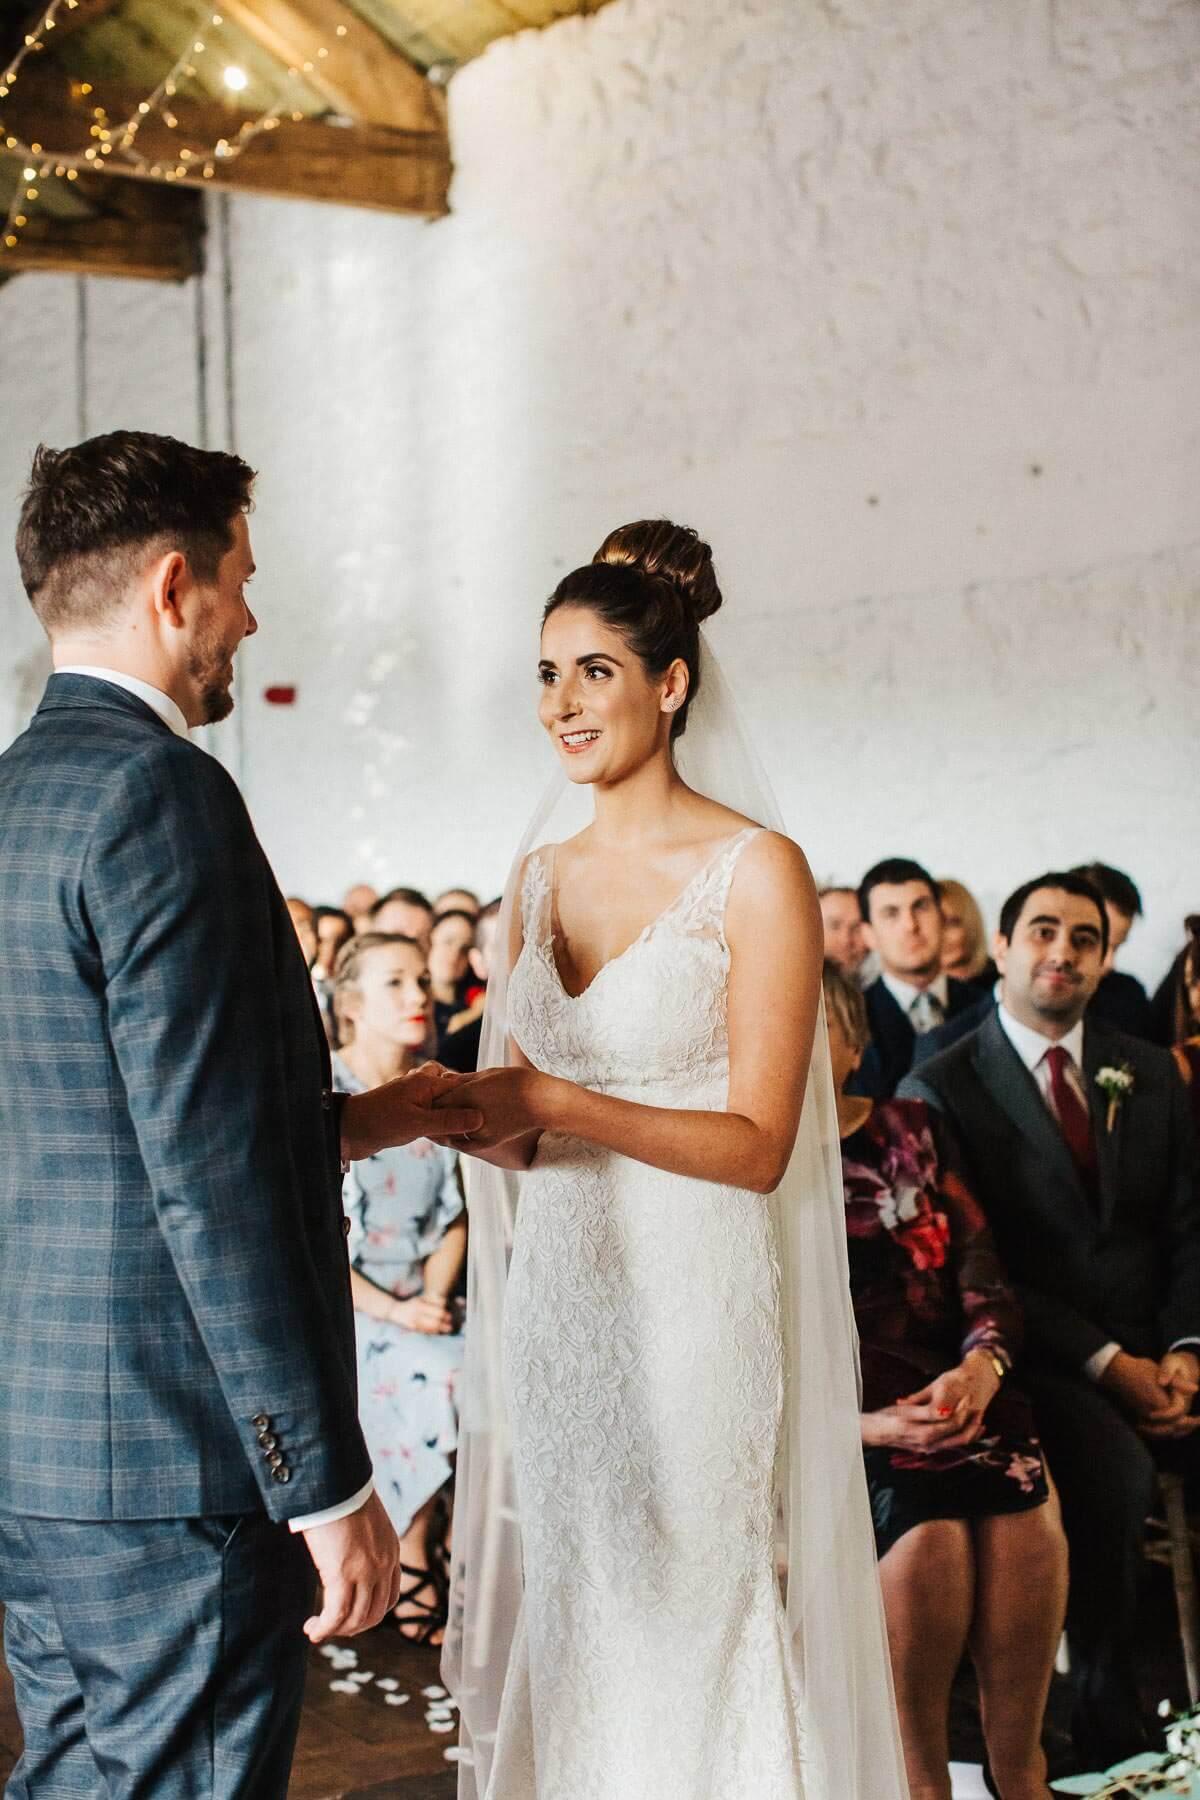 Elegant bride wearing lace dress